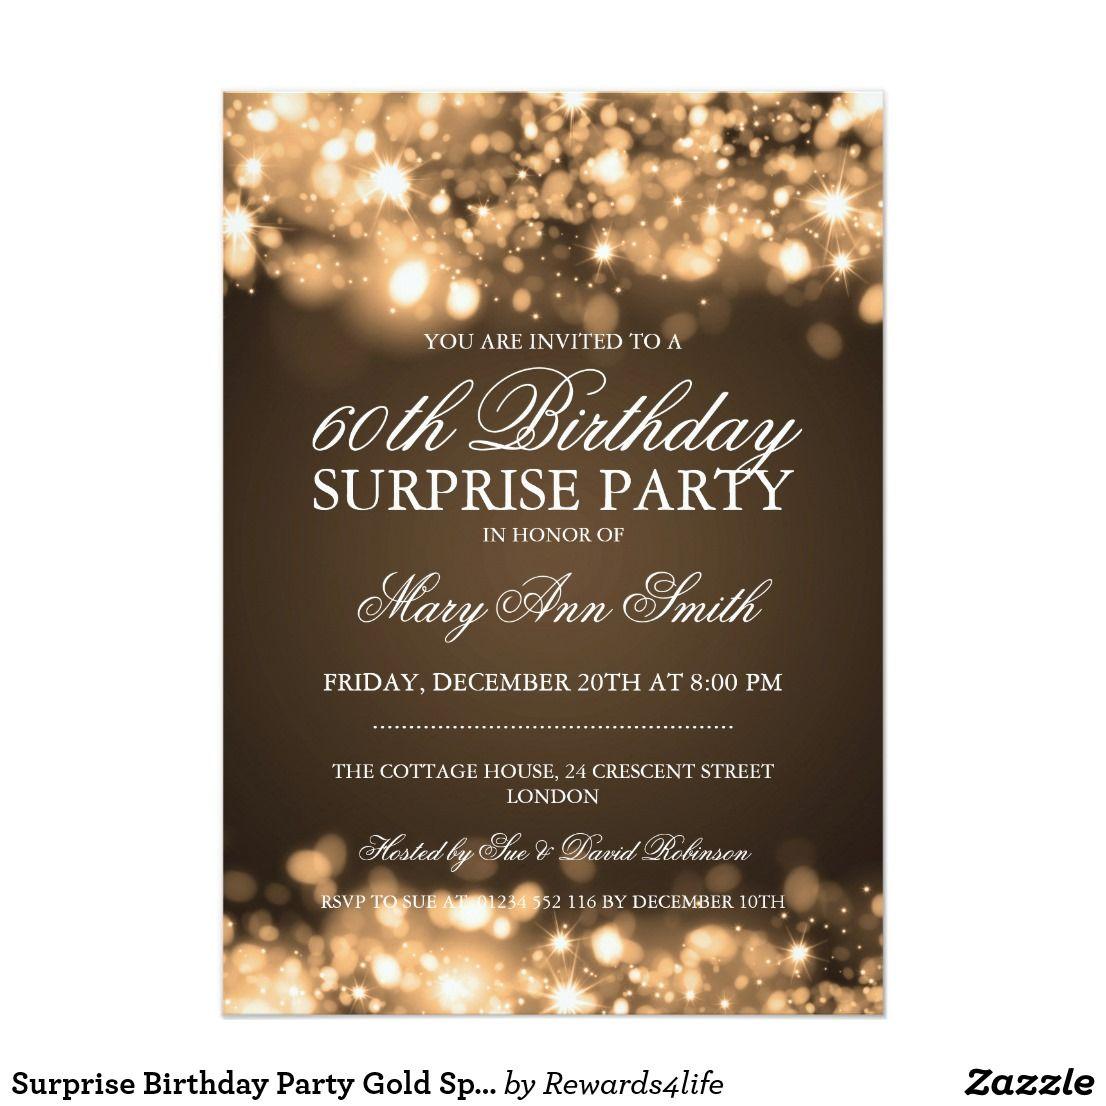 Surprise Birthday Party Gold Sparkling Lights Invitation Zazzle Com Birthday Surprise Party Surprise Birthday Party Invitations Gold Invitations